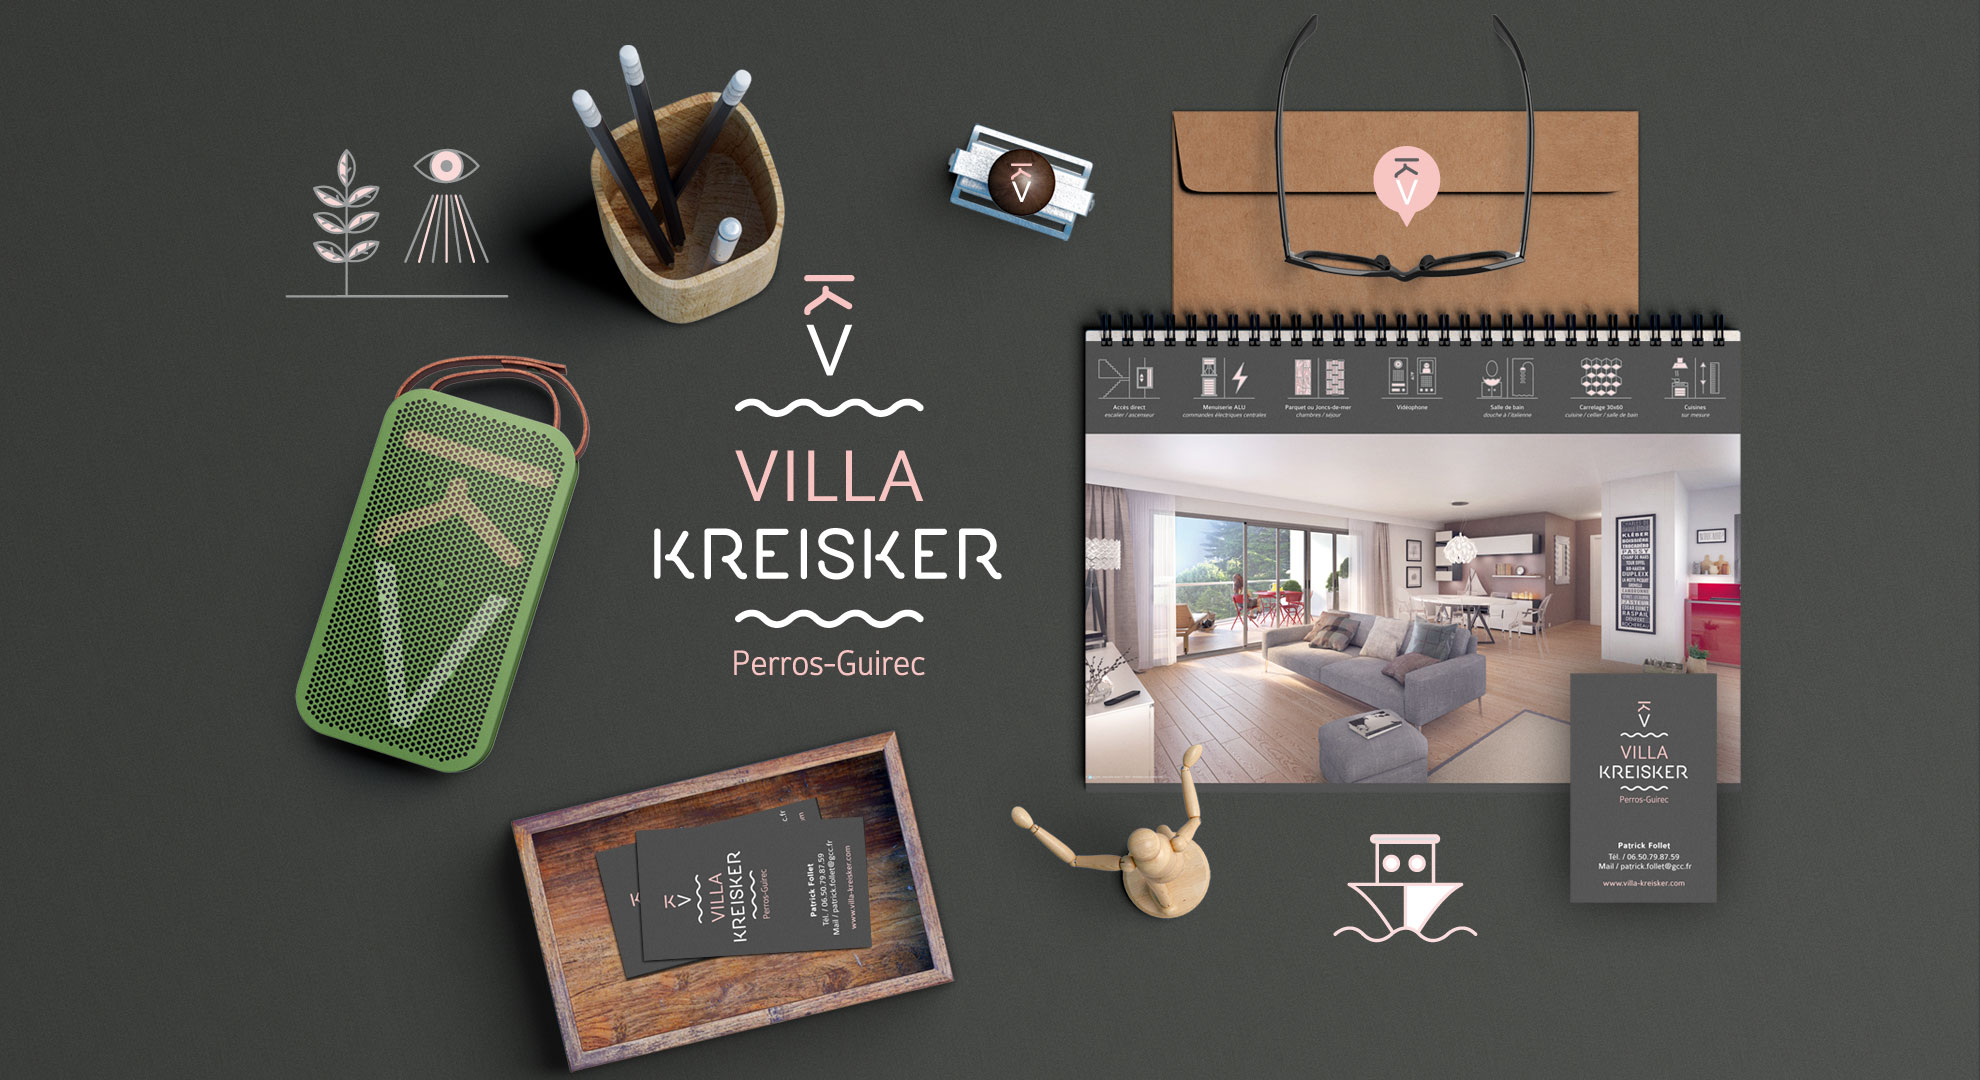 Villa kreisker à Perros Guirec-communication globale-Coqueliko